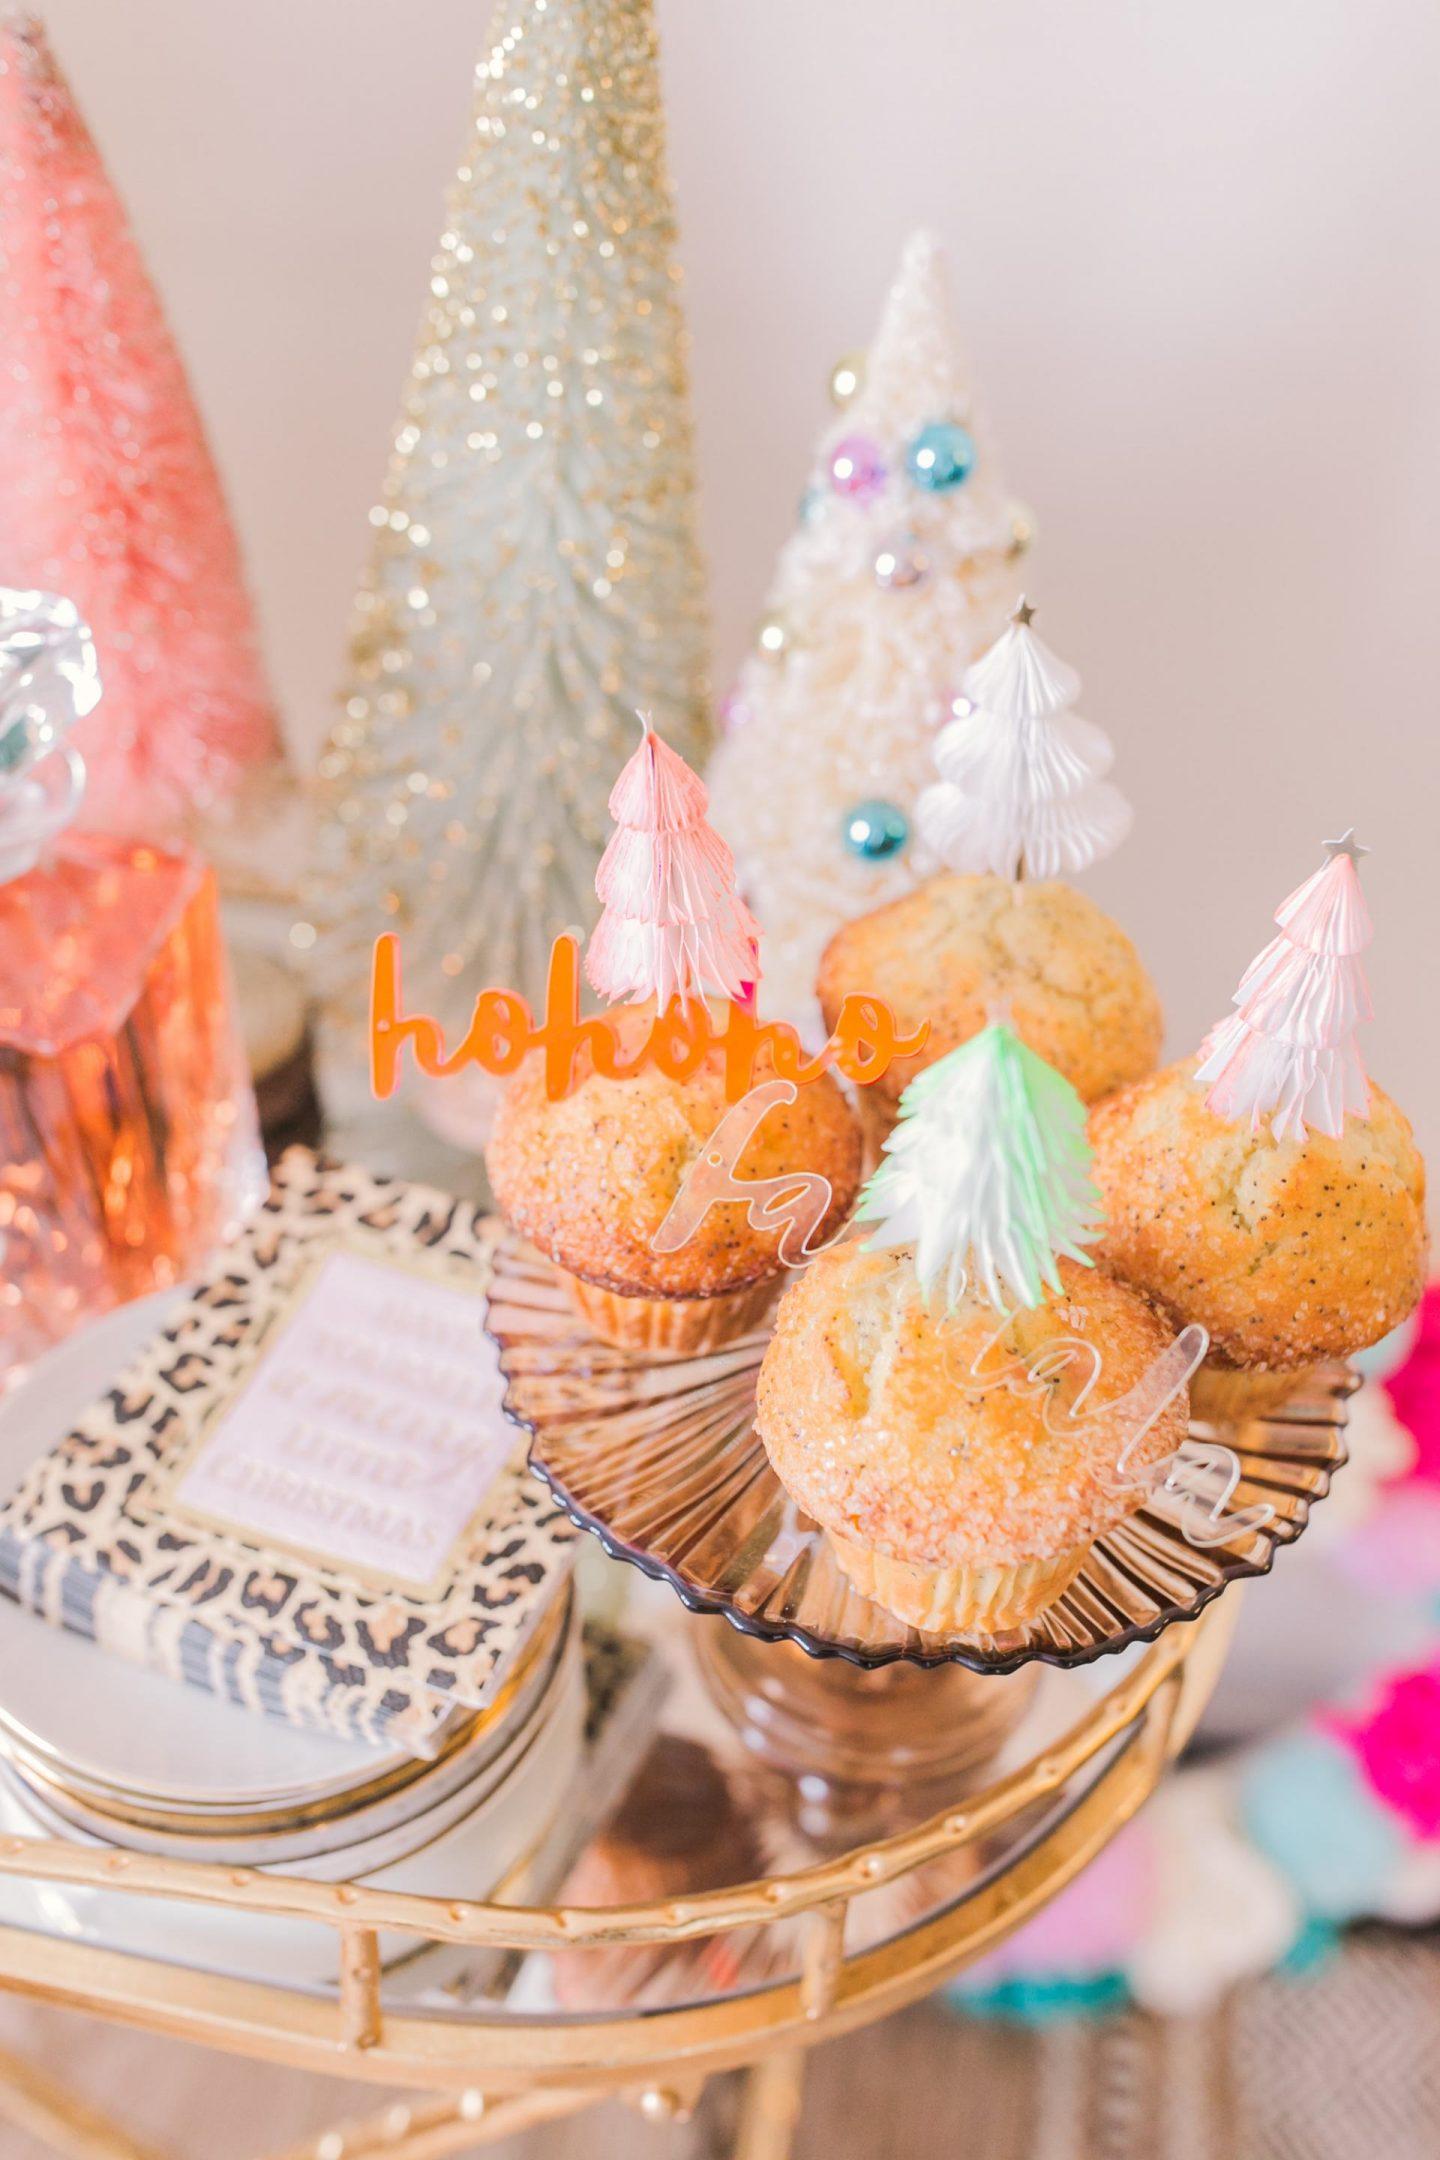 Tips for Decorating Your Holiday Bar Cart - Bijuleni